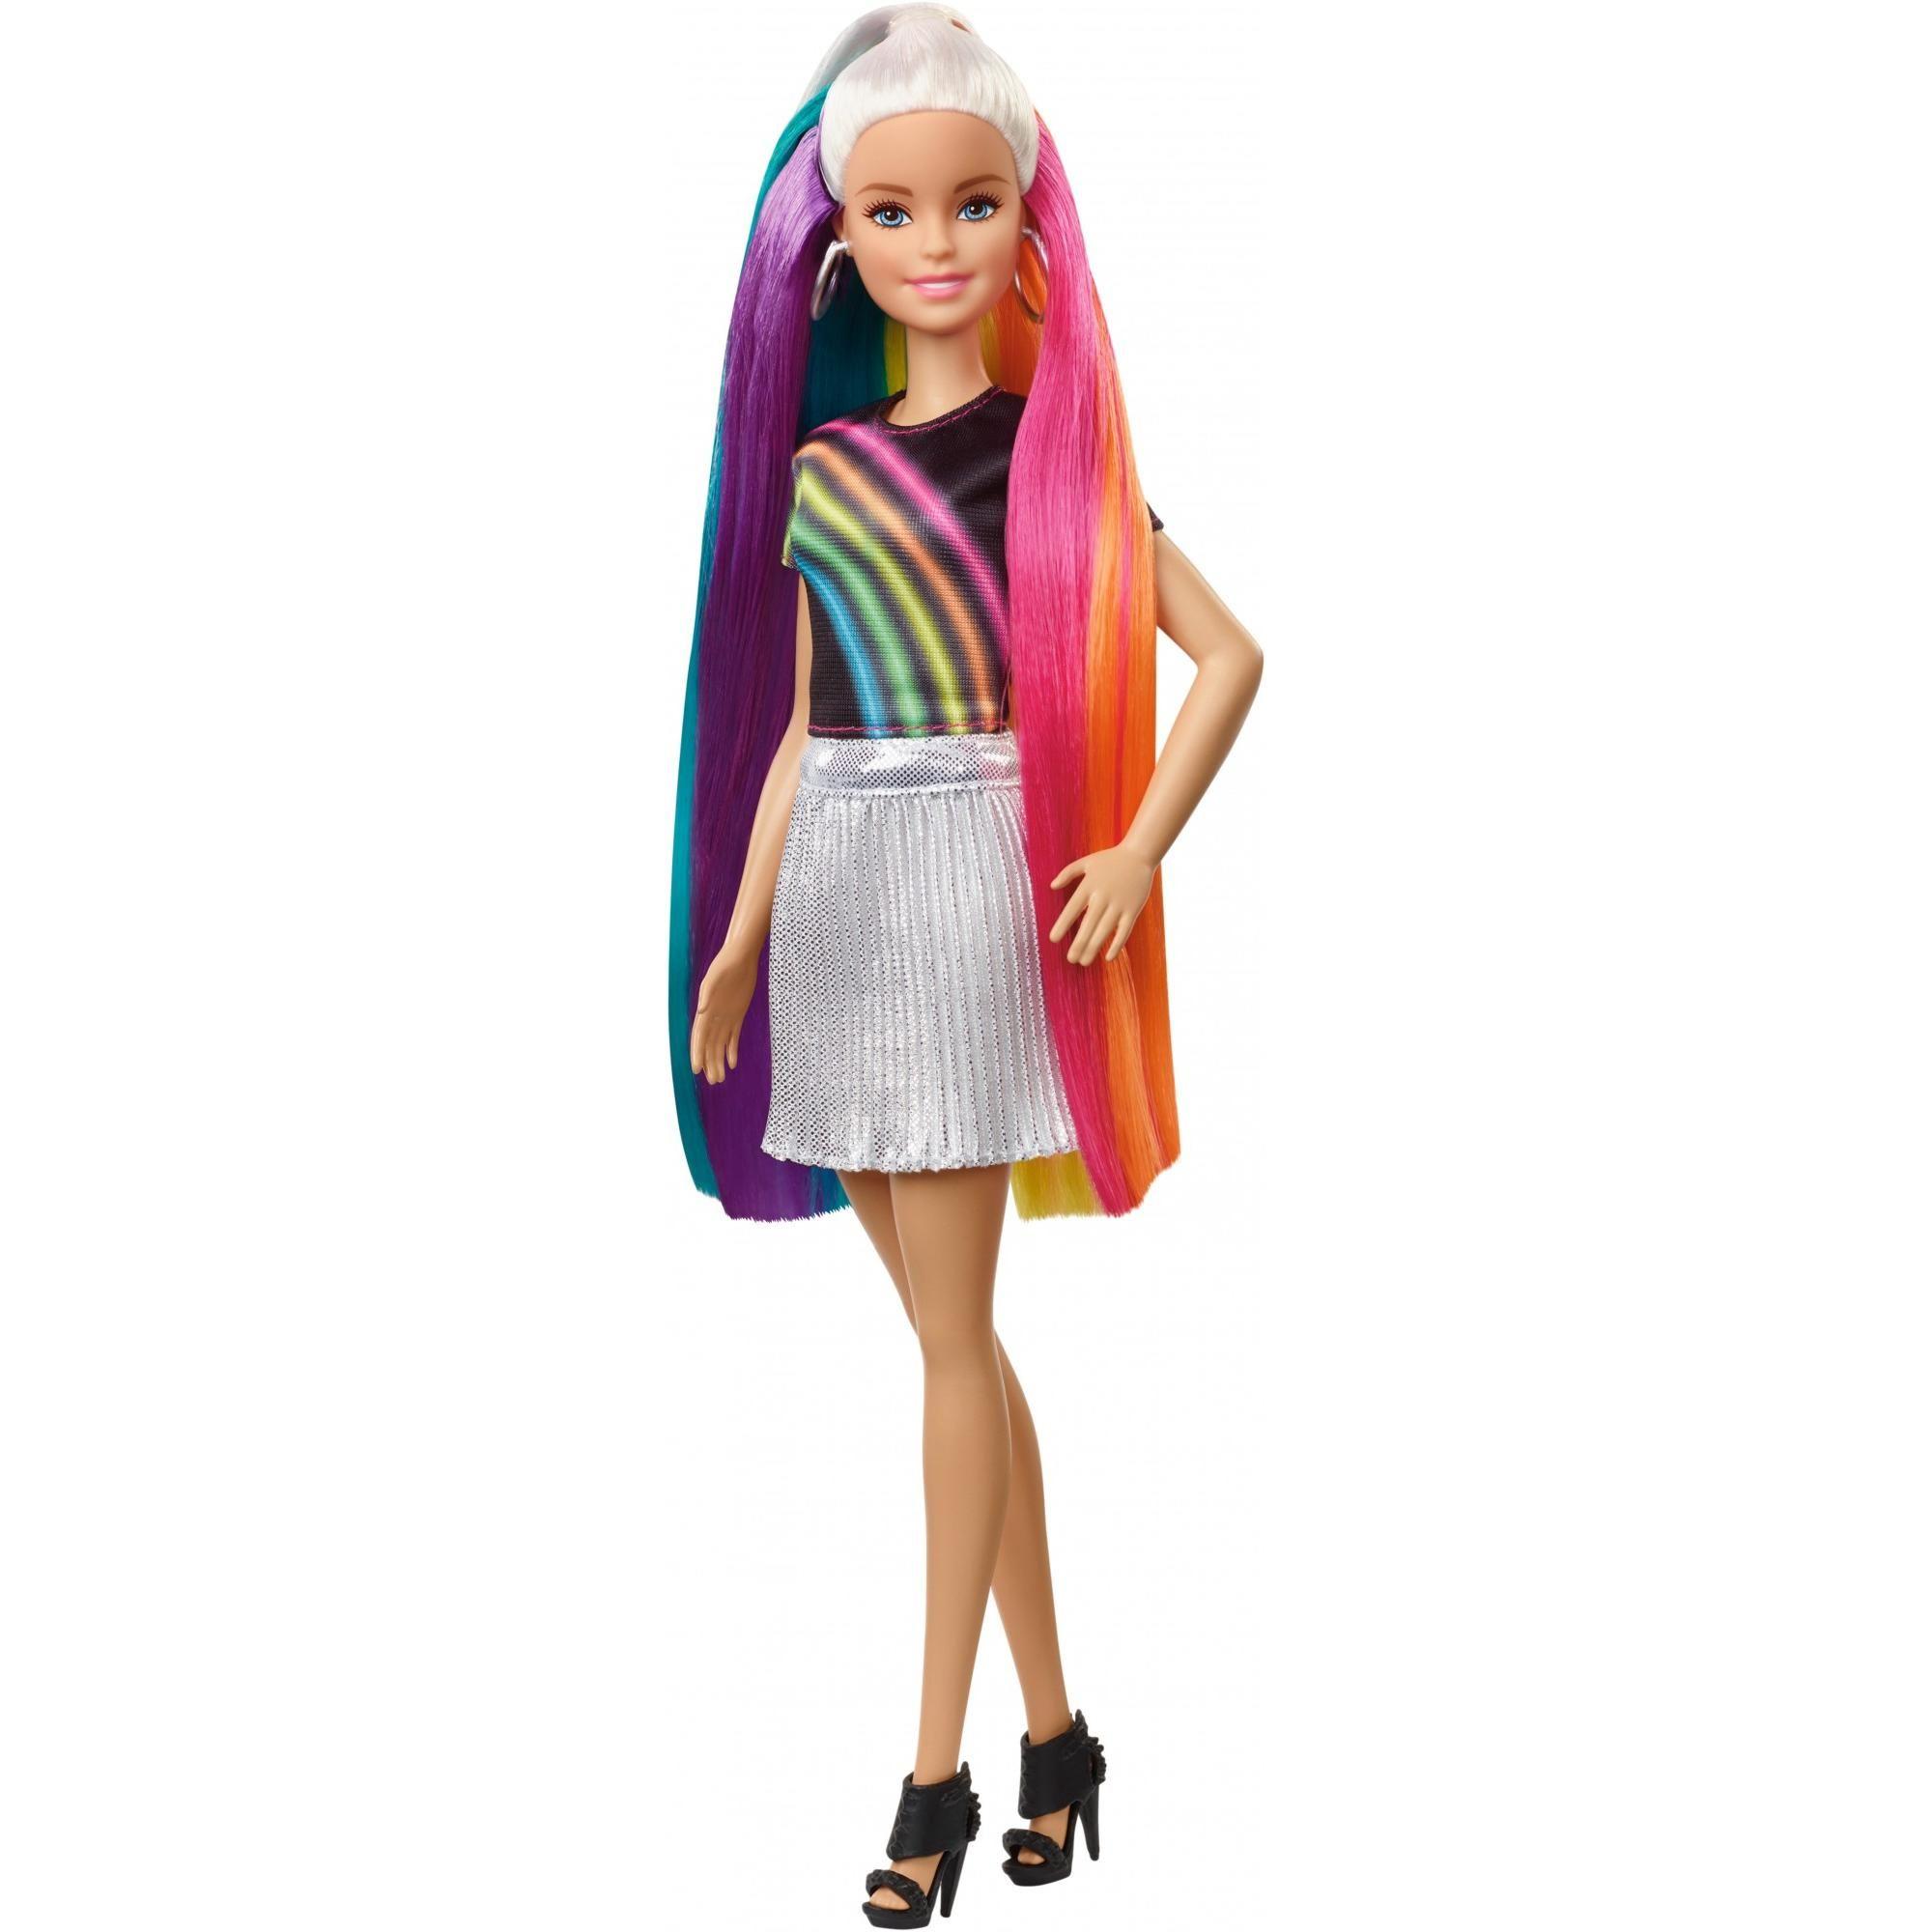 Barbie Rainbow Sparkle Hair Doll Blonde With Accessories Walmart Com In 2020 Girl Hair Colors Doll Hair Barbie Hair